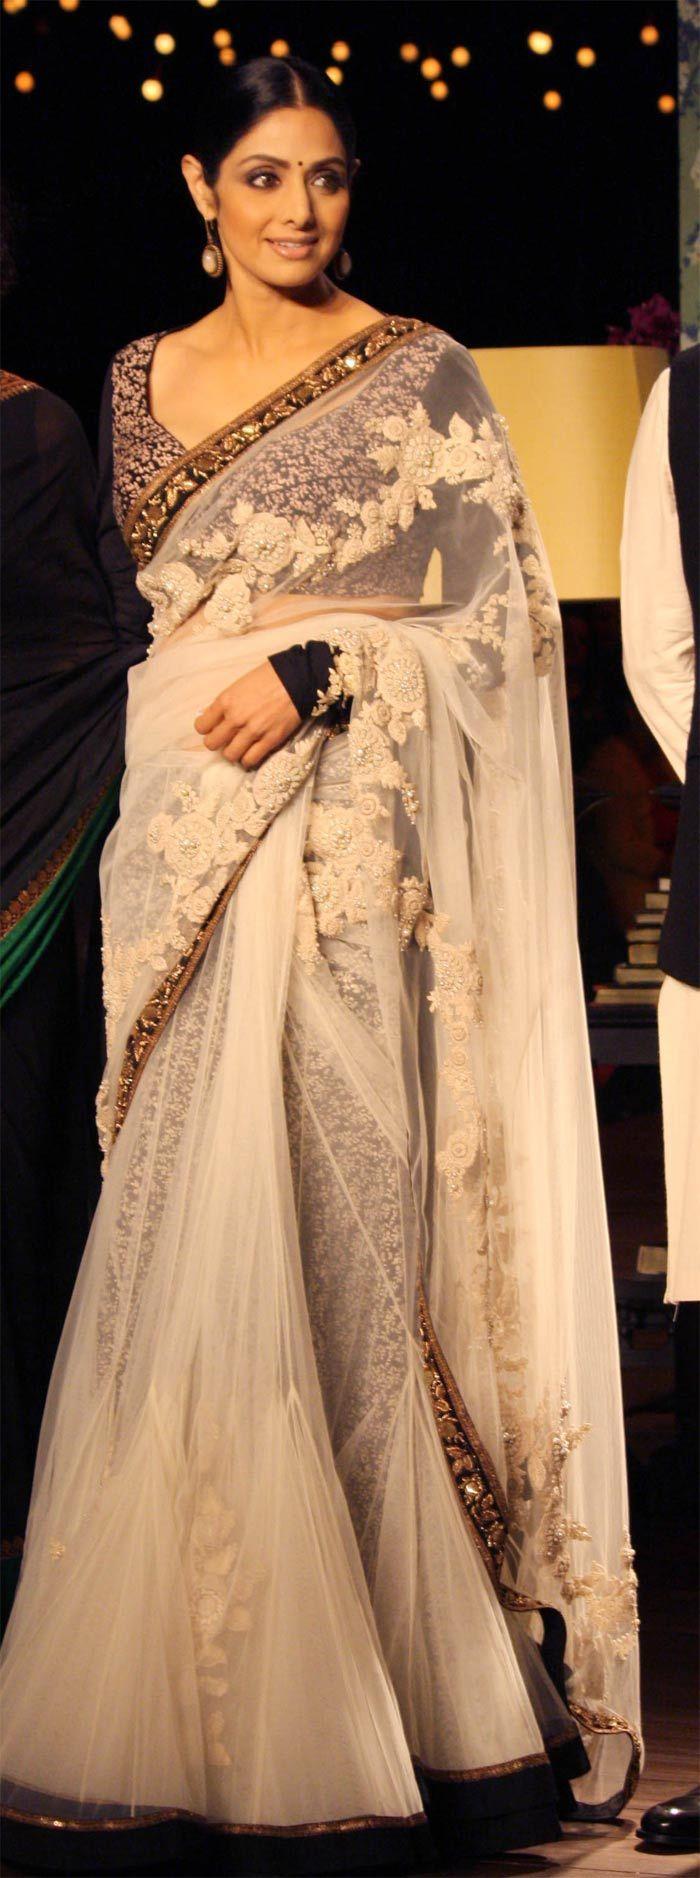 An elegant white chiffon Sabyasachi sari.